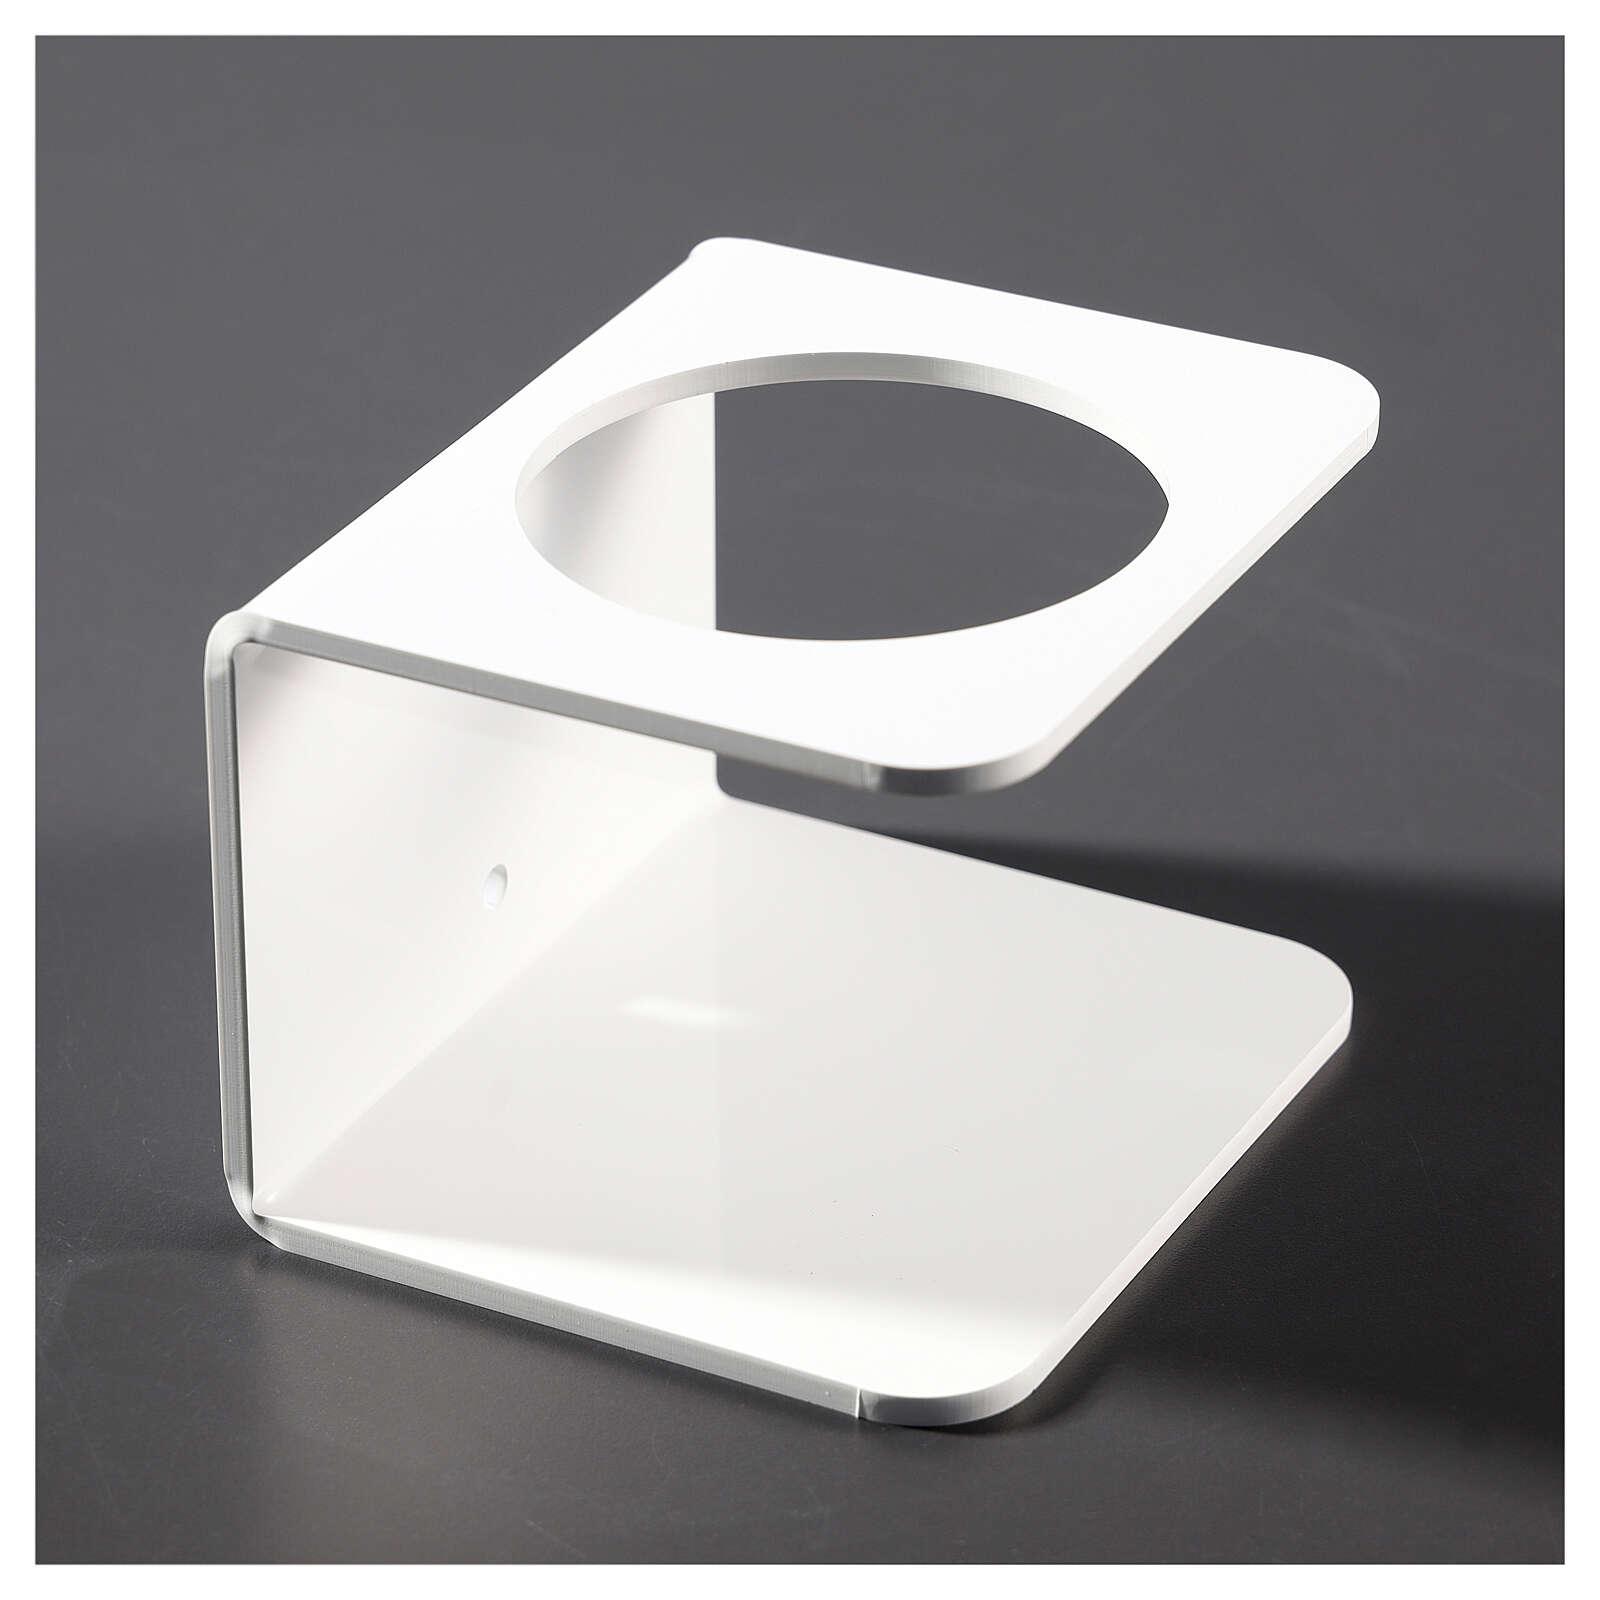 Porta-dispensador de plexiglás Blanco para desinfectante 3